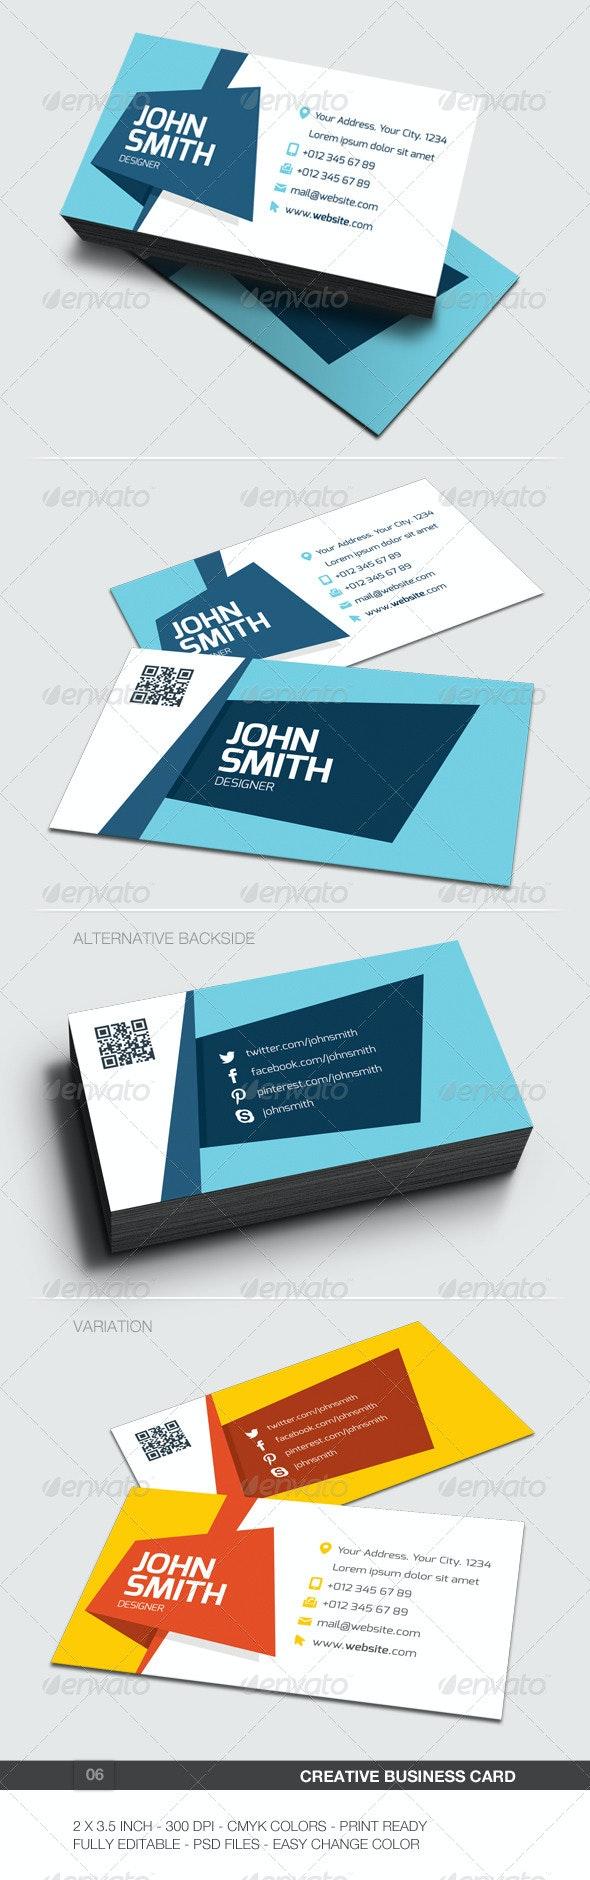 Creative Business Card - 06 - Creative Business Cards